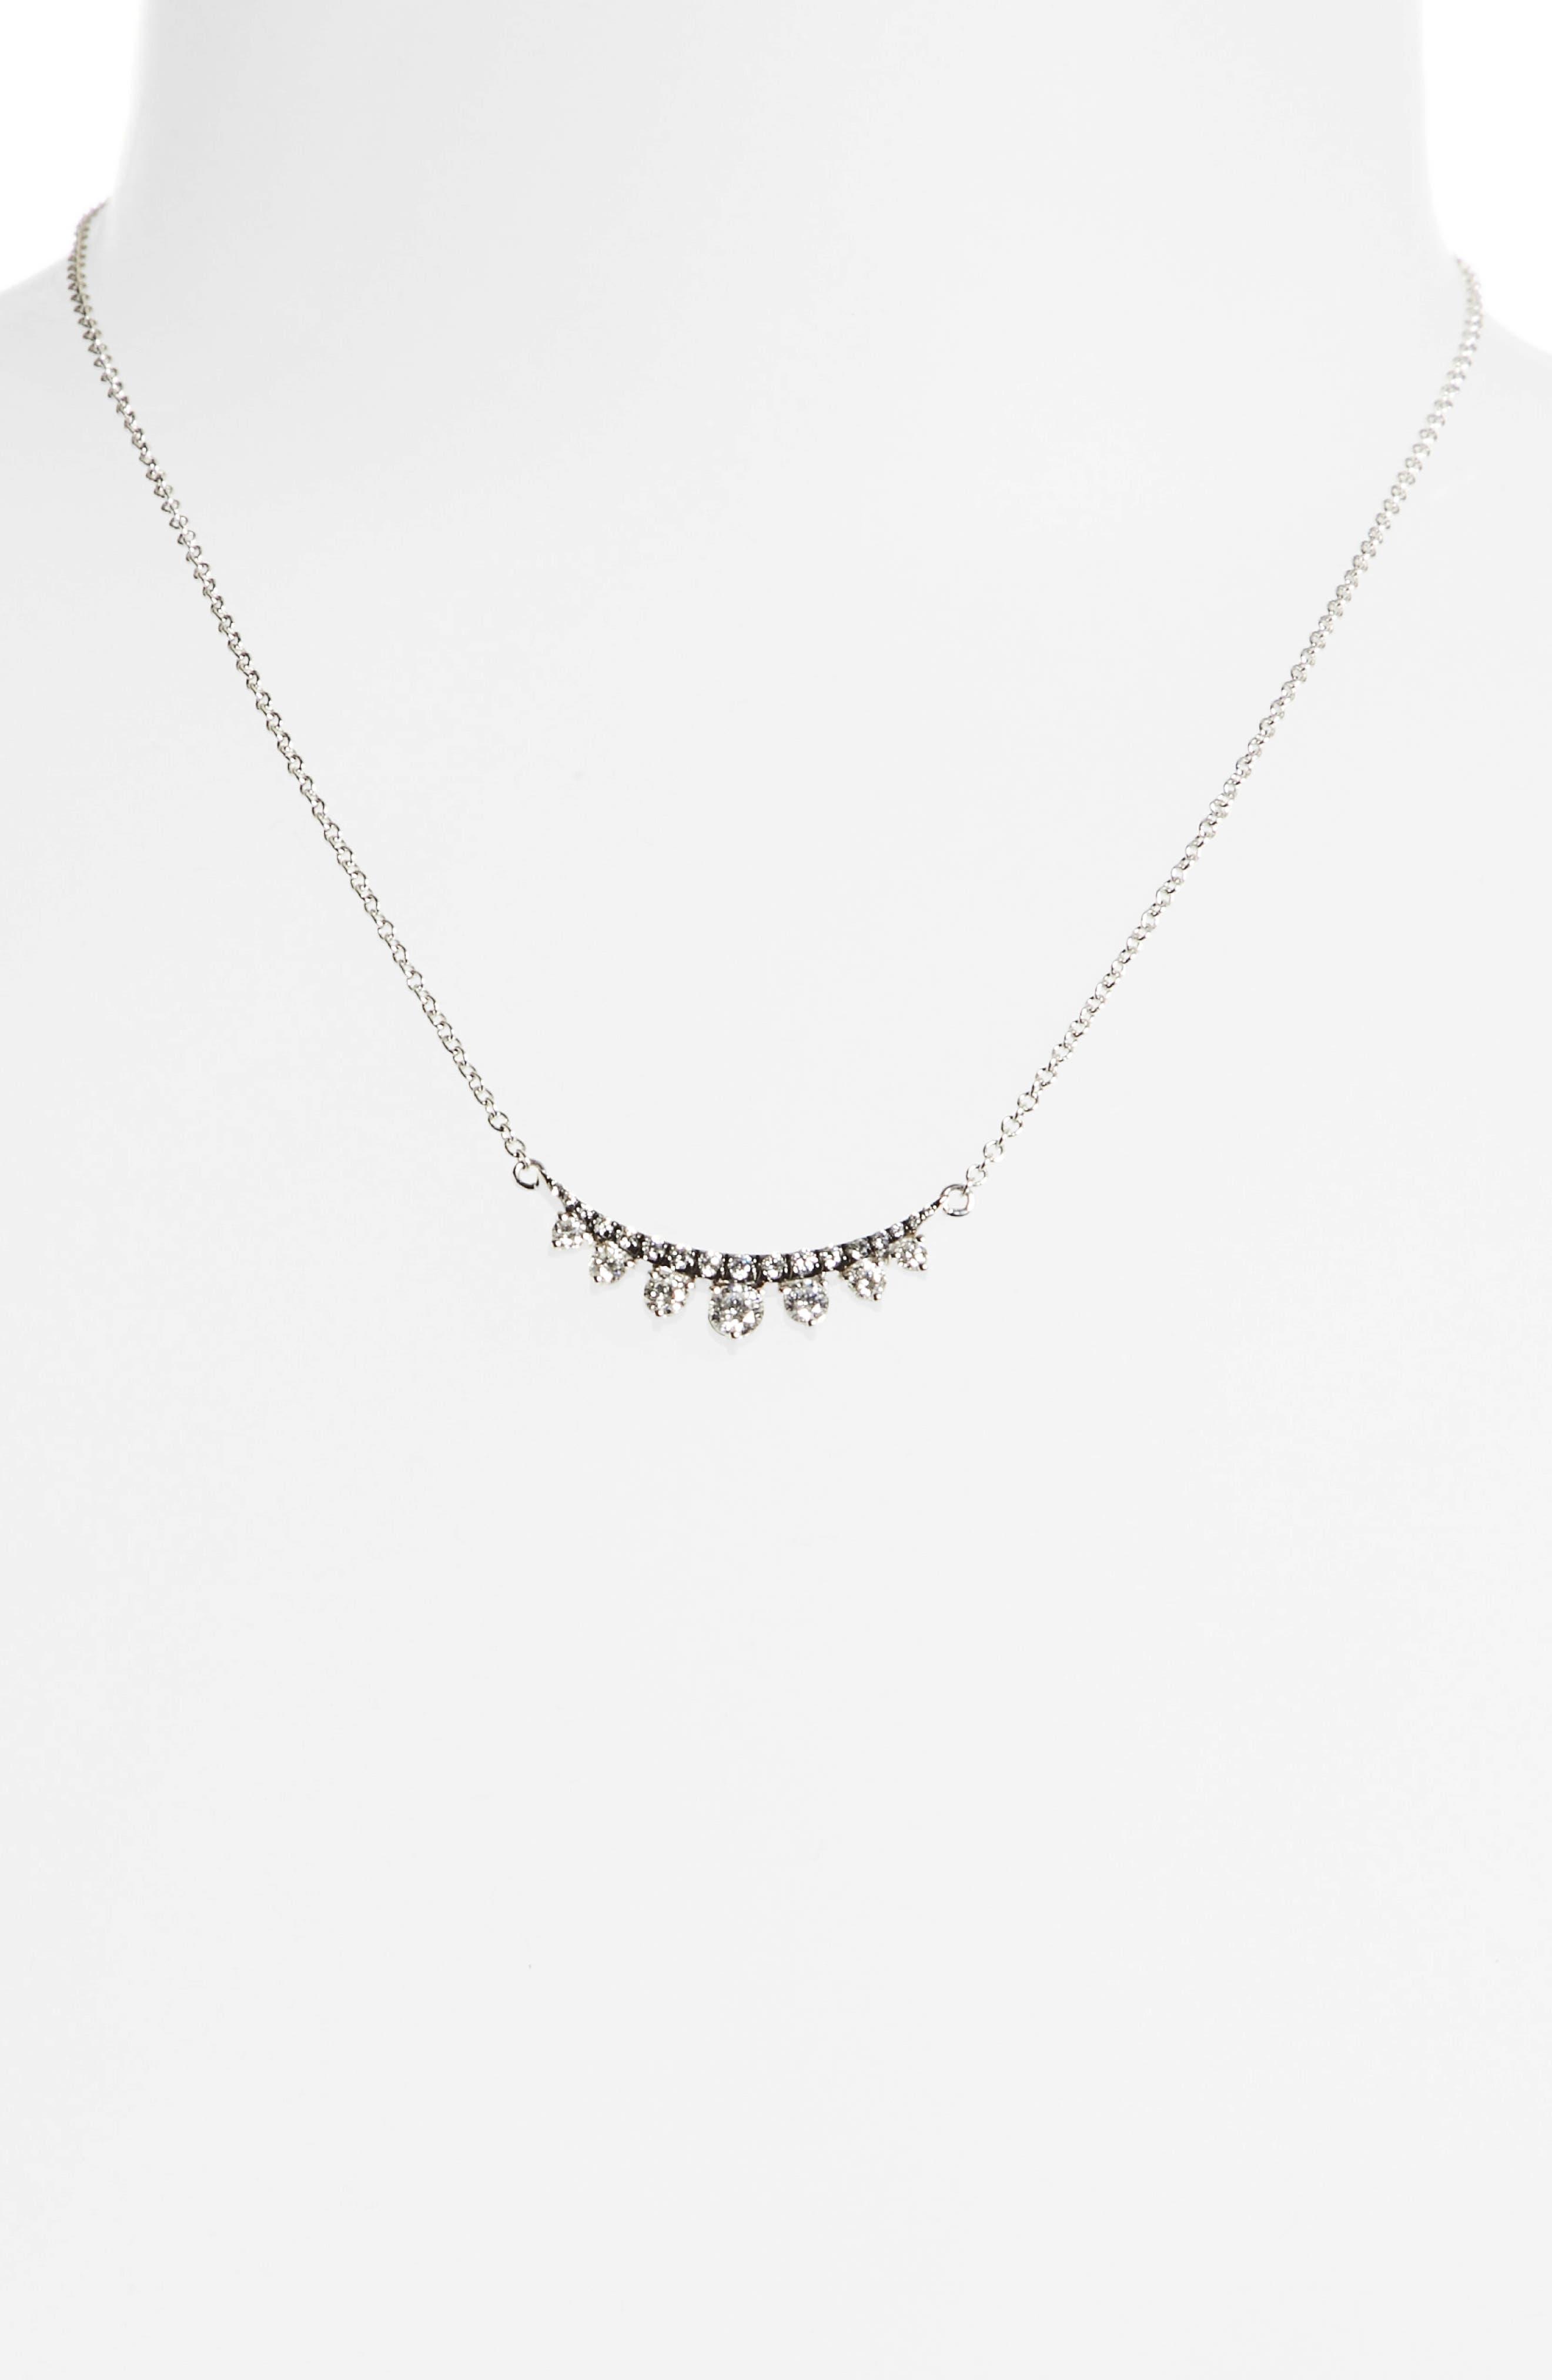 Prive Luxe 18K White Gold & Diamond Necklace,                             Alternate thumbnail 2, color,                             710